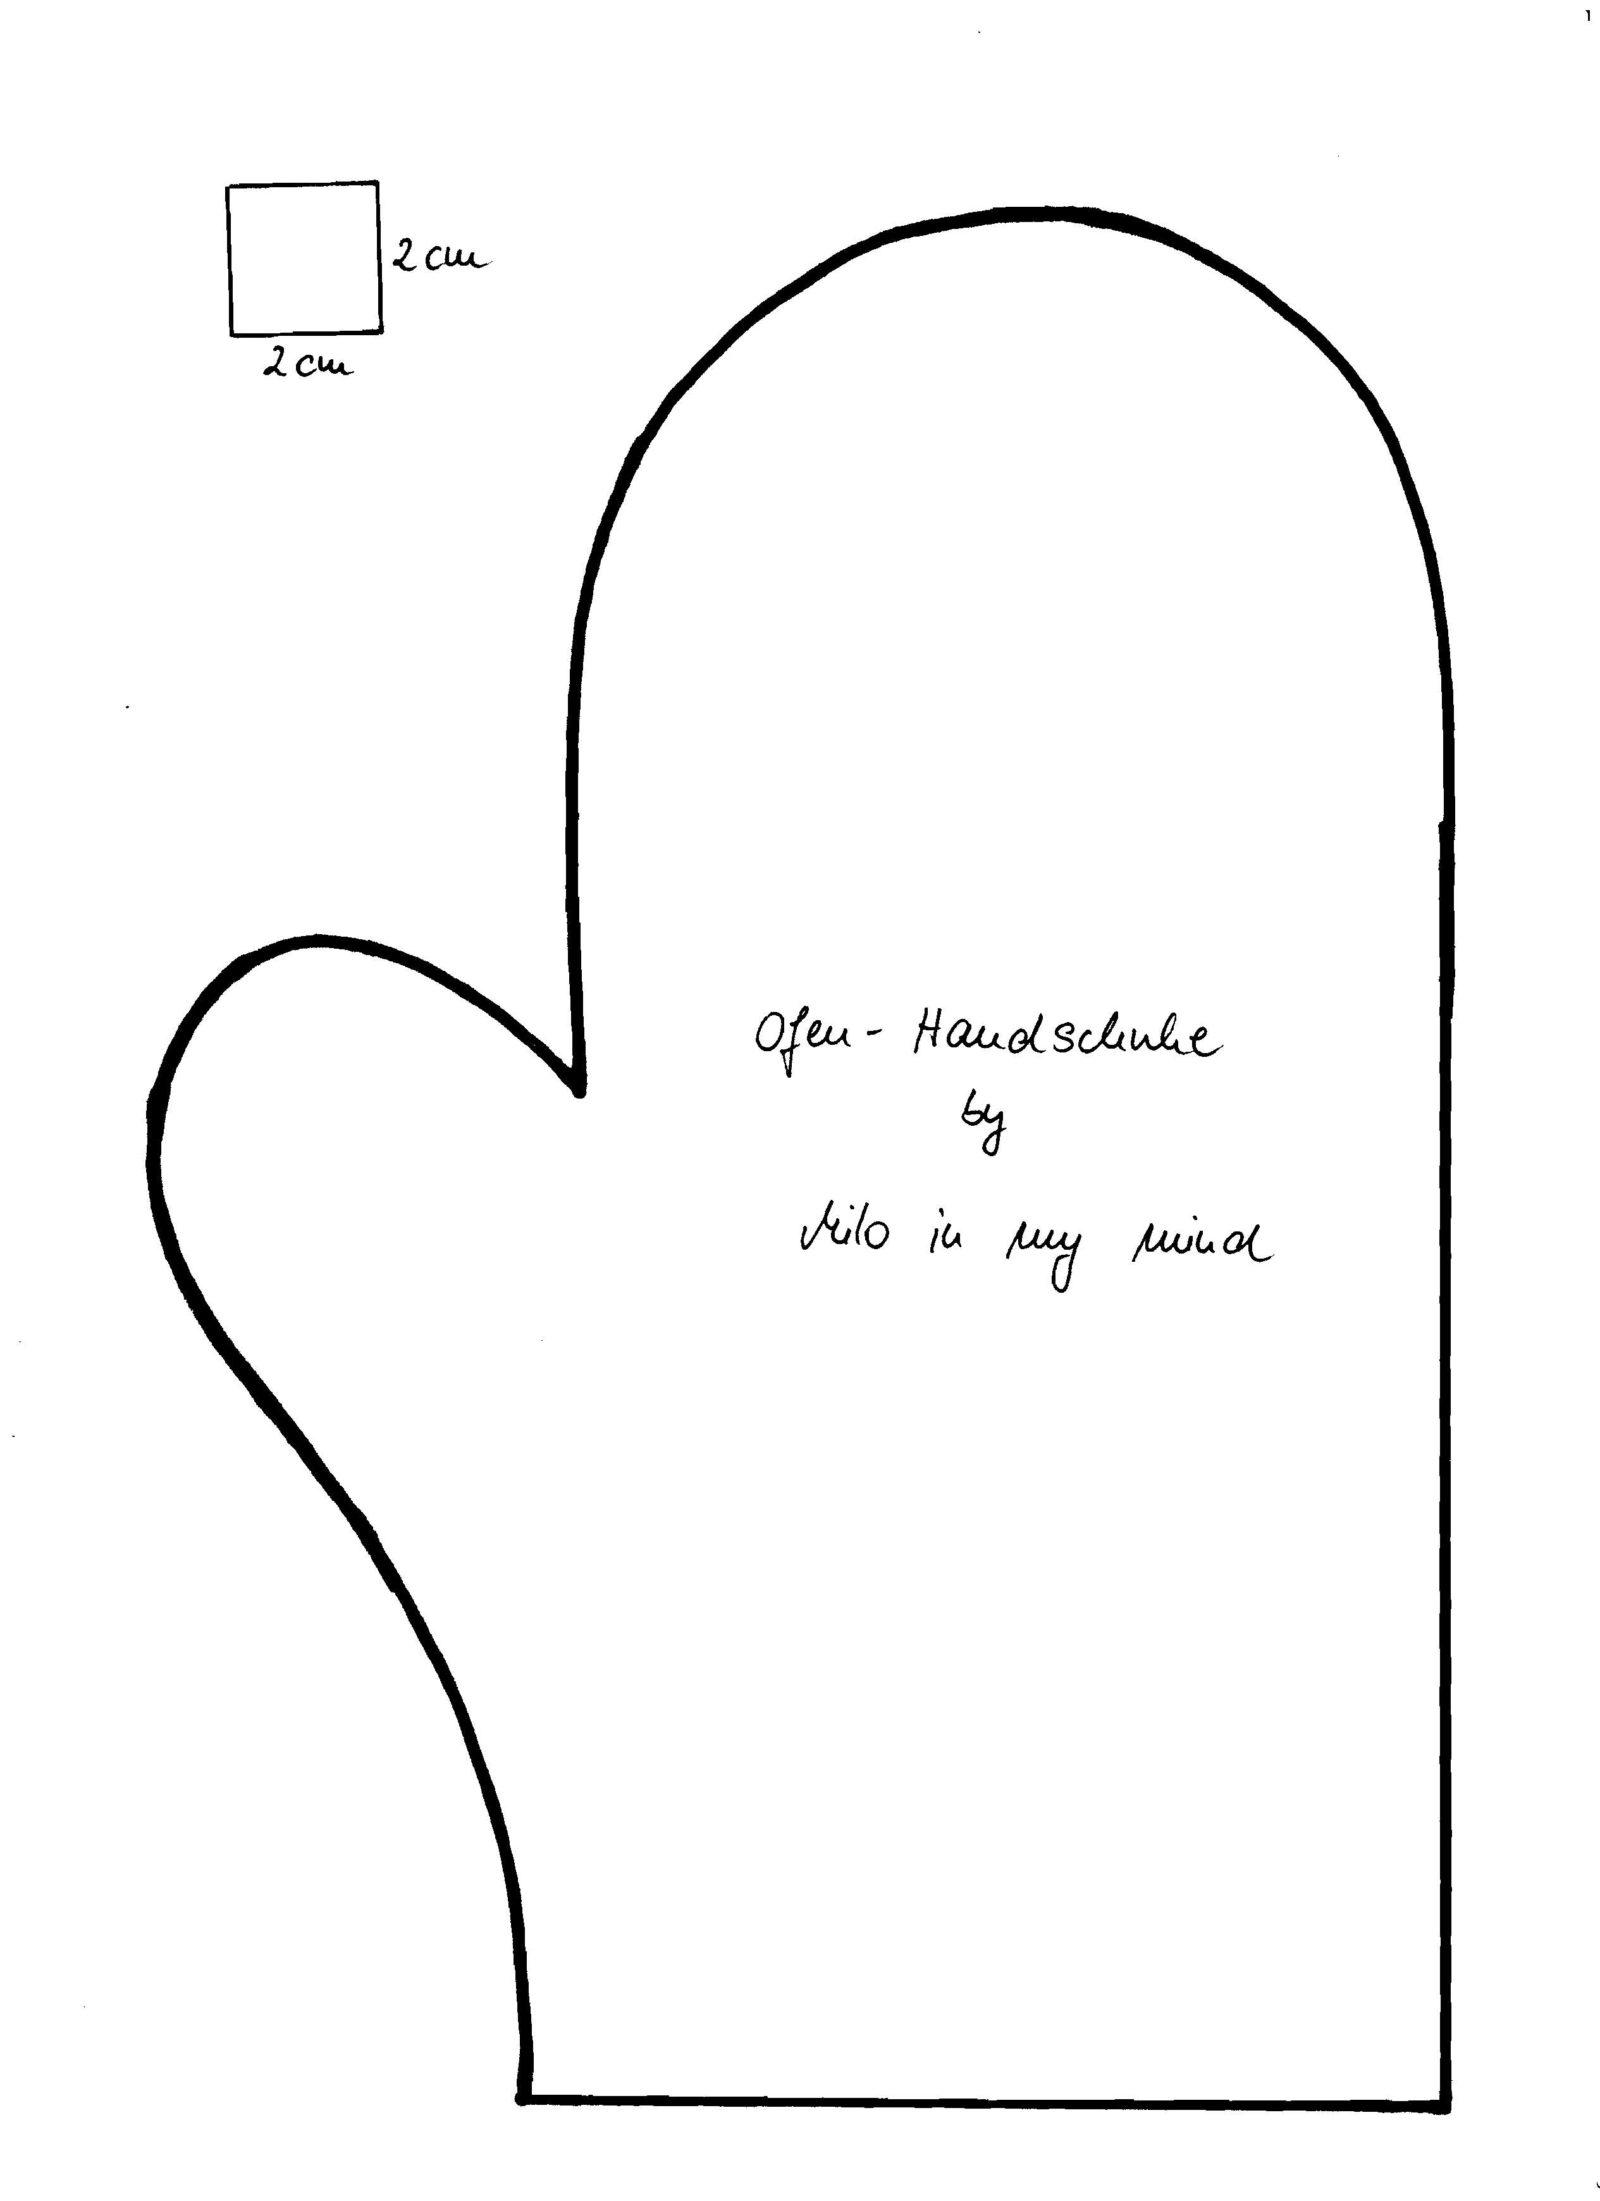 Ofen-Handschuhe - Handmade Kultur